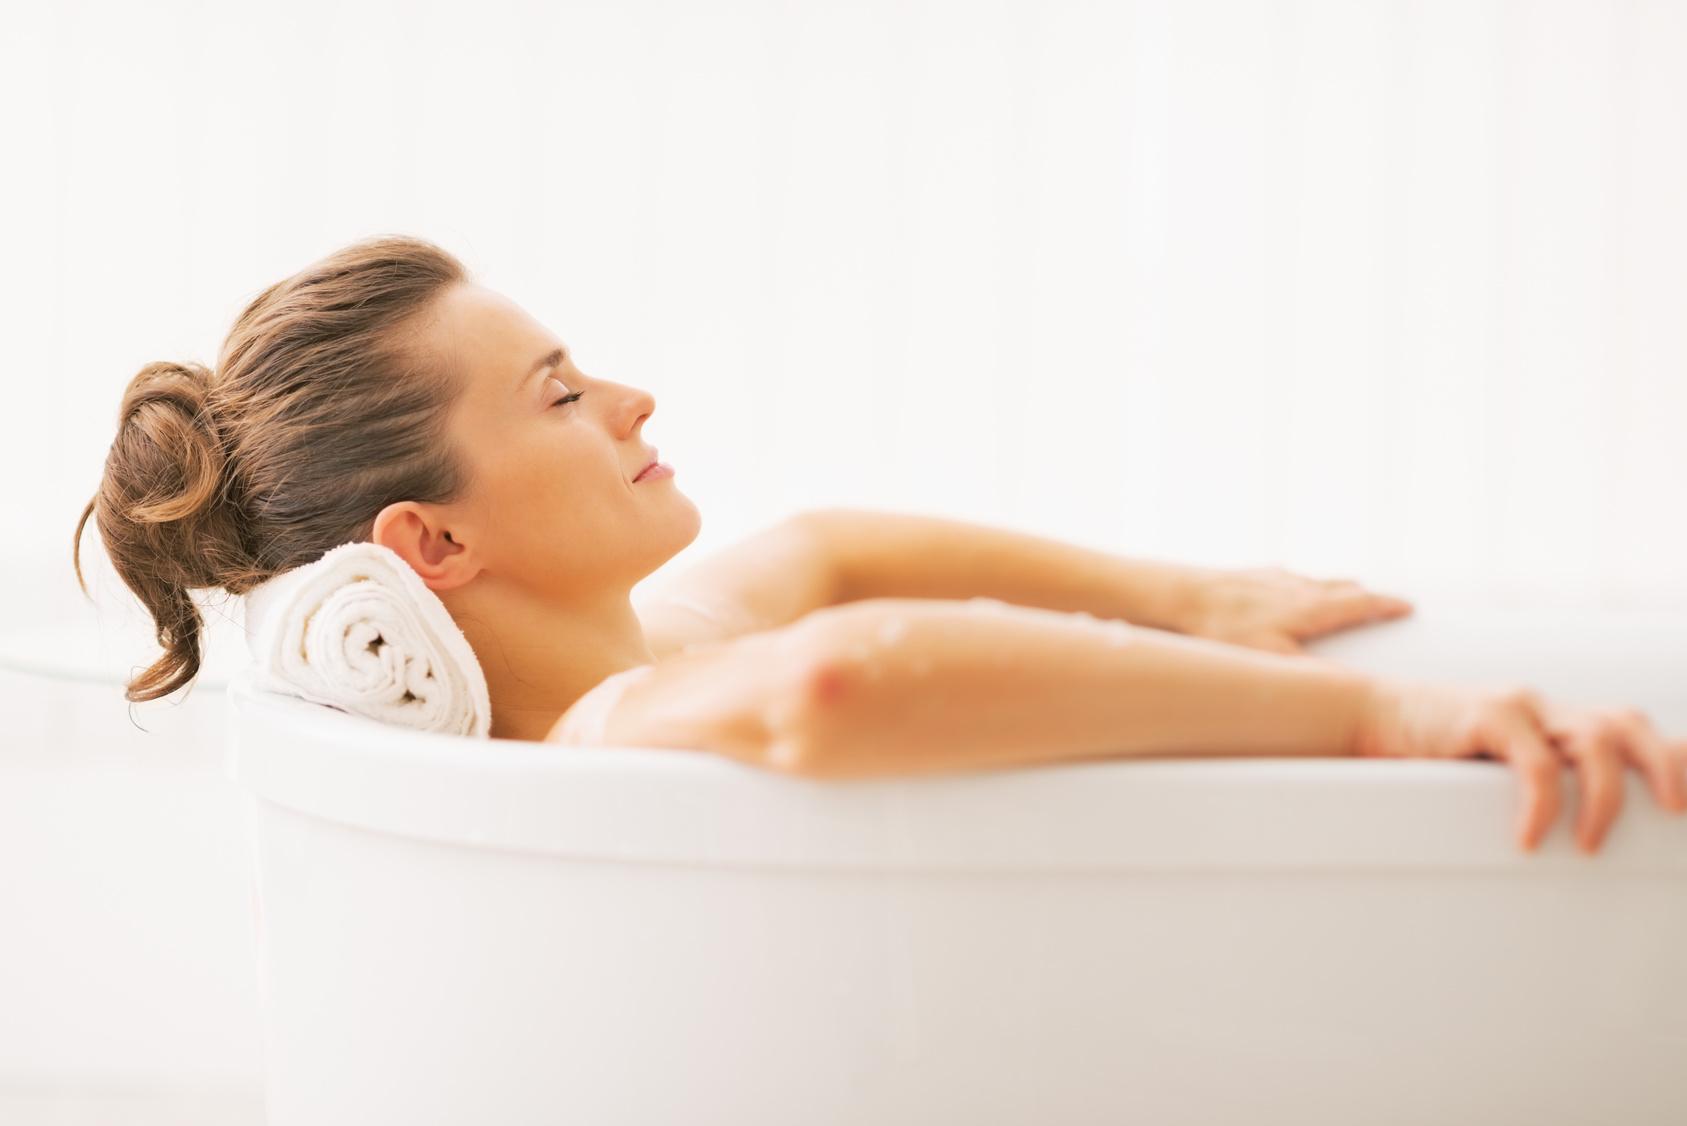 Heißes Bad hilft bei Muskelkater